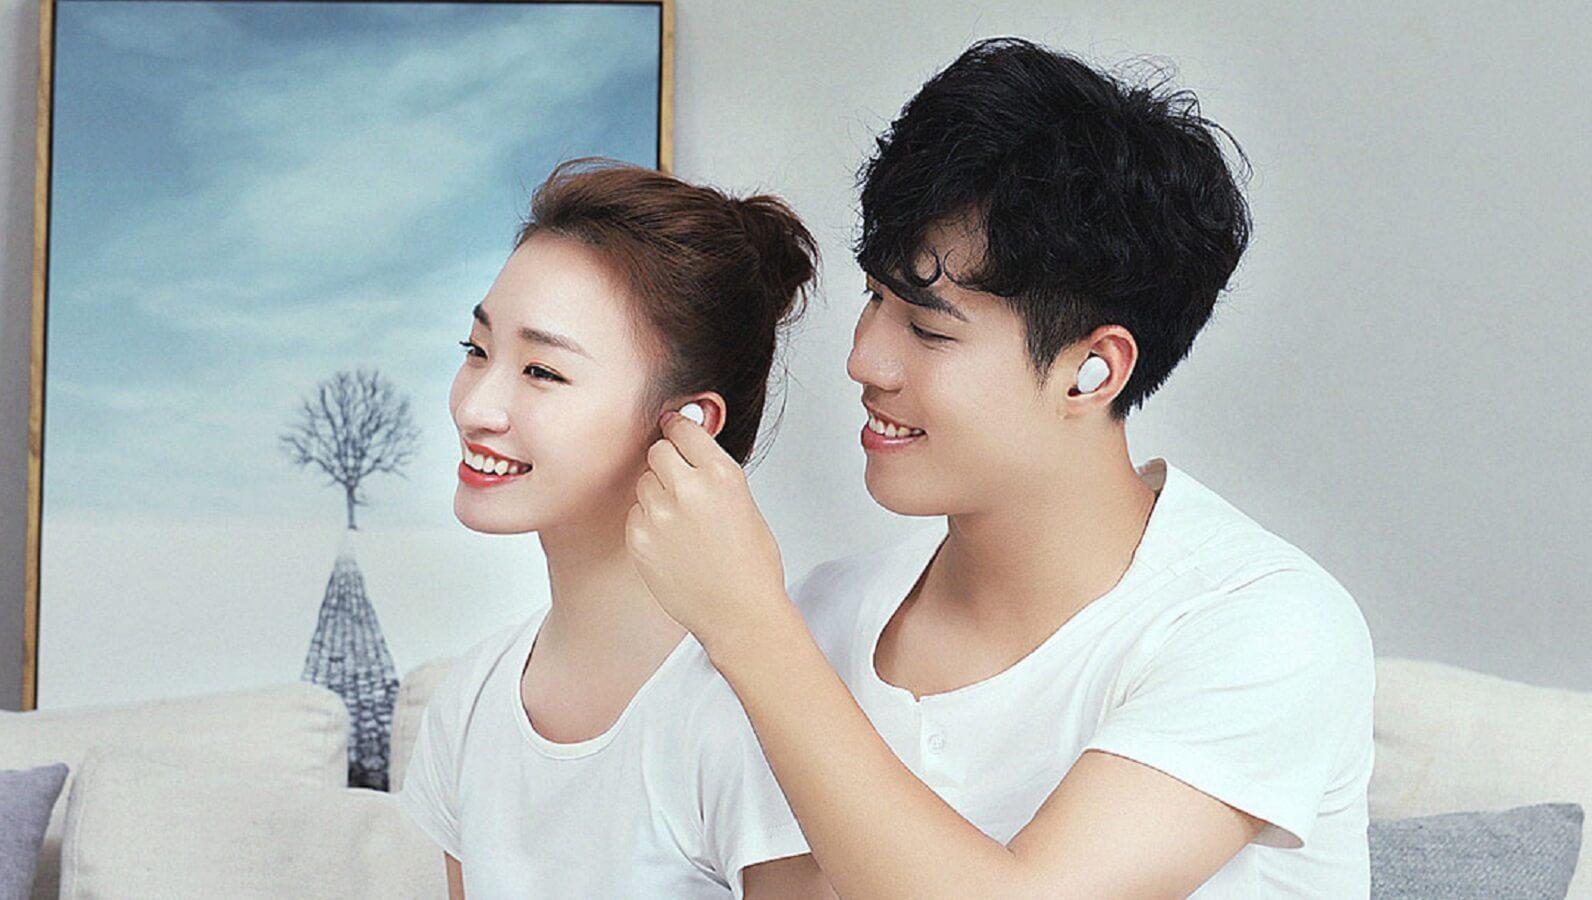 xiaomi airdots wireless earbuds